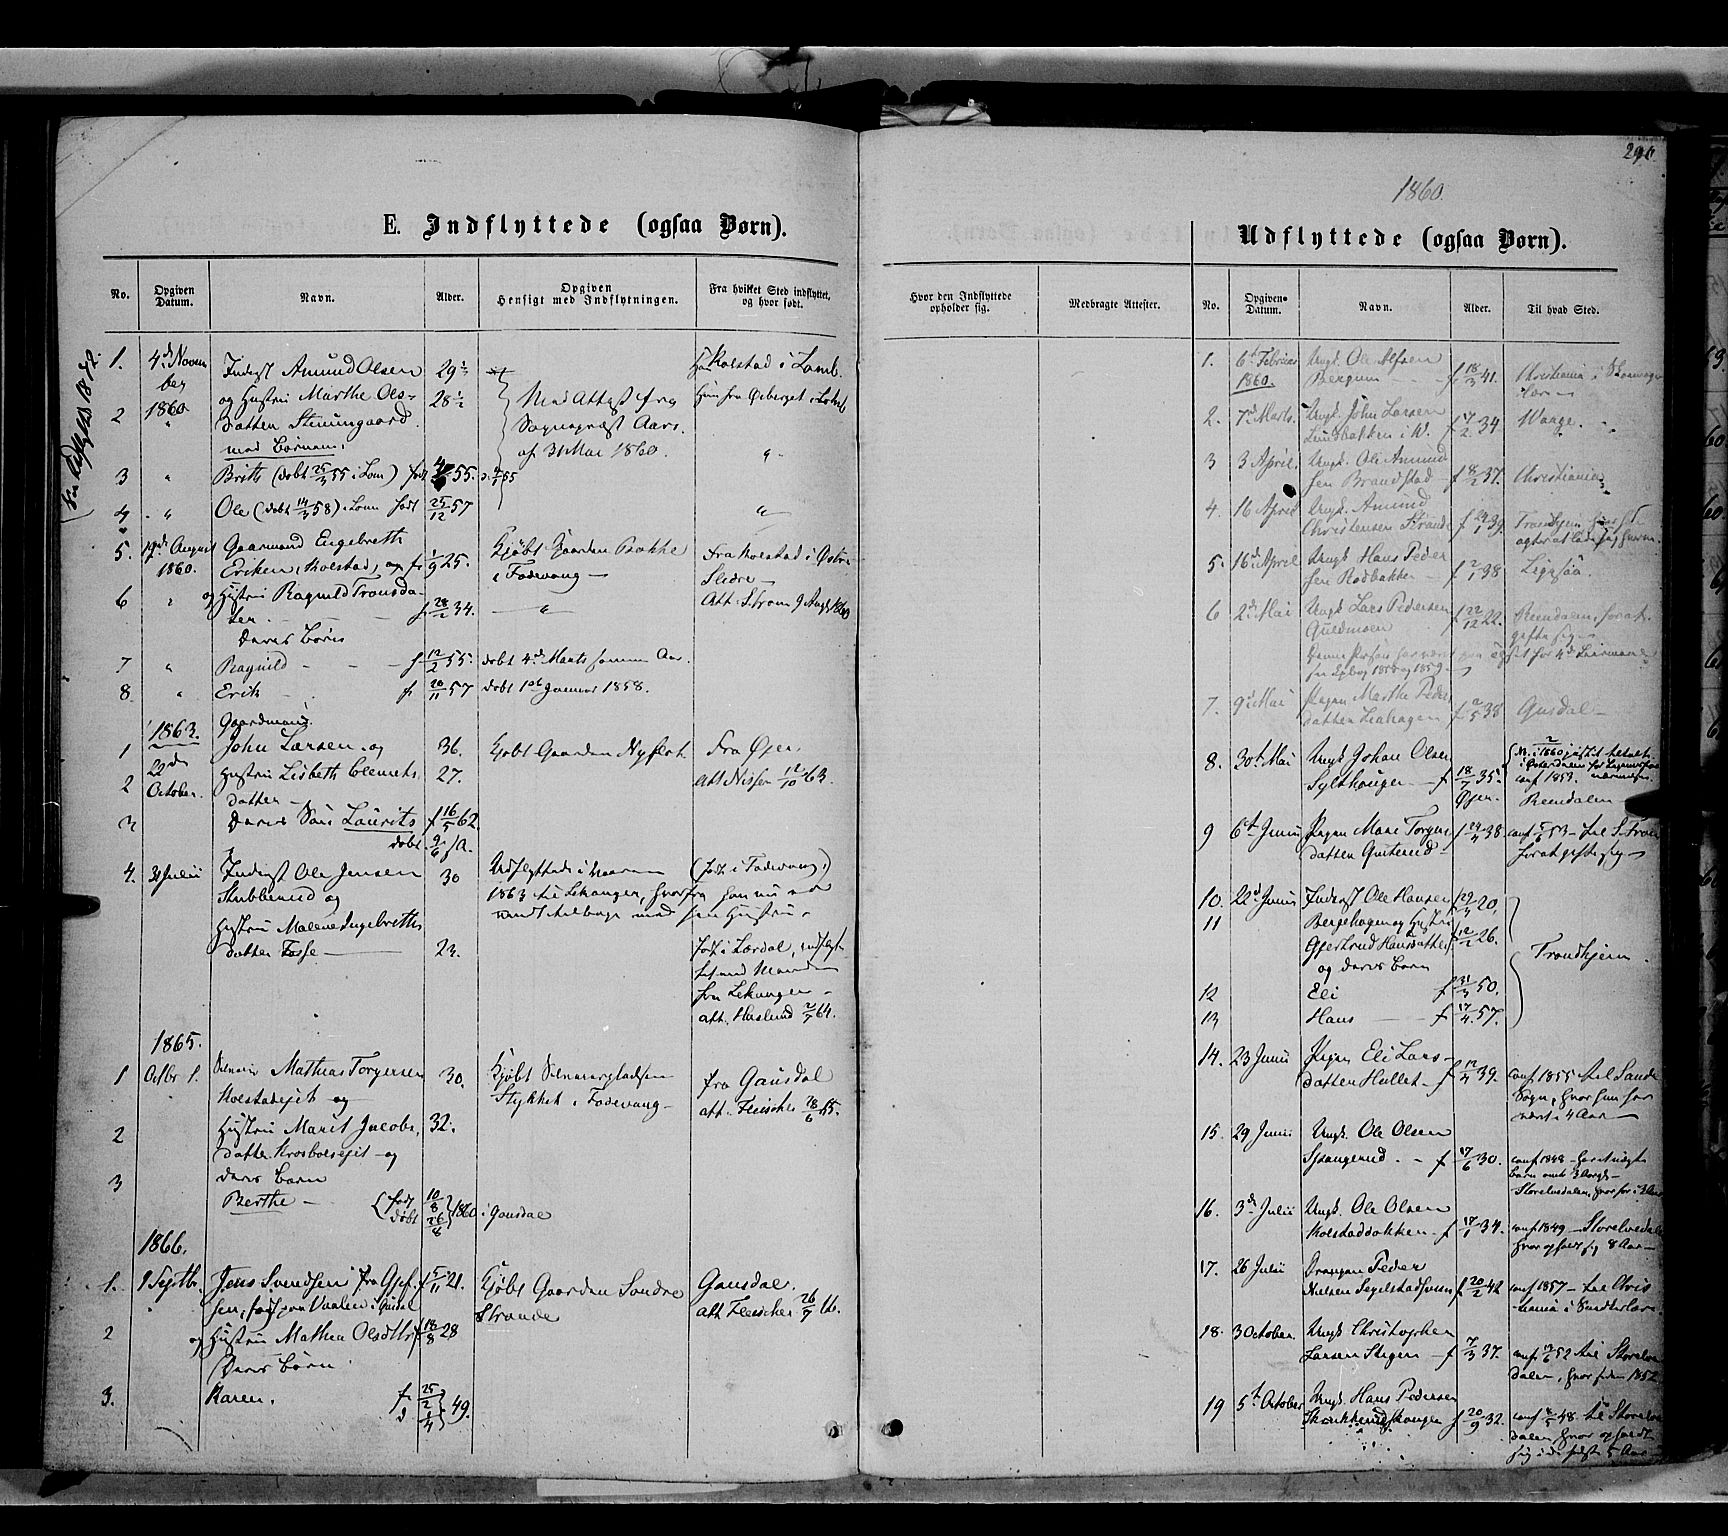 SAH, Ringebu prestekontor, Ministerialbok nr. 7, 1860-1877, s. 290